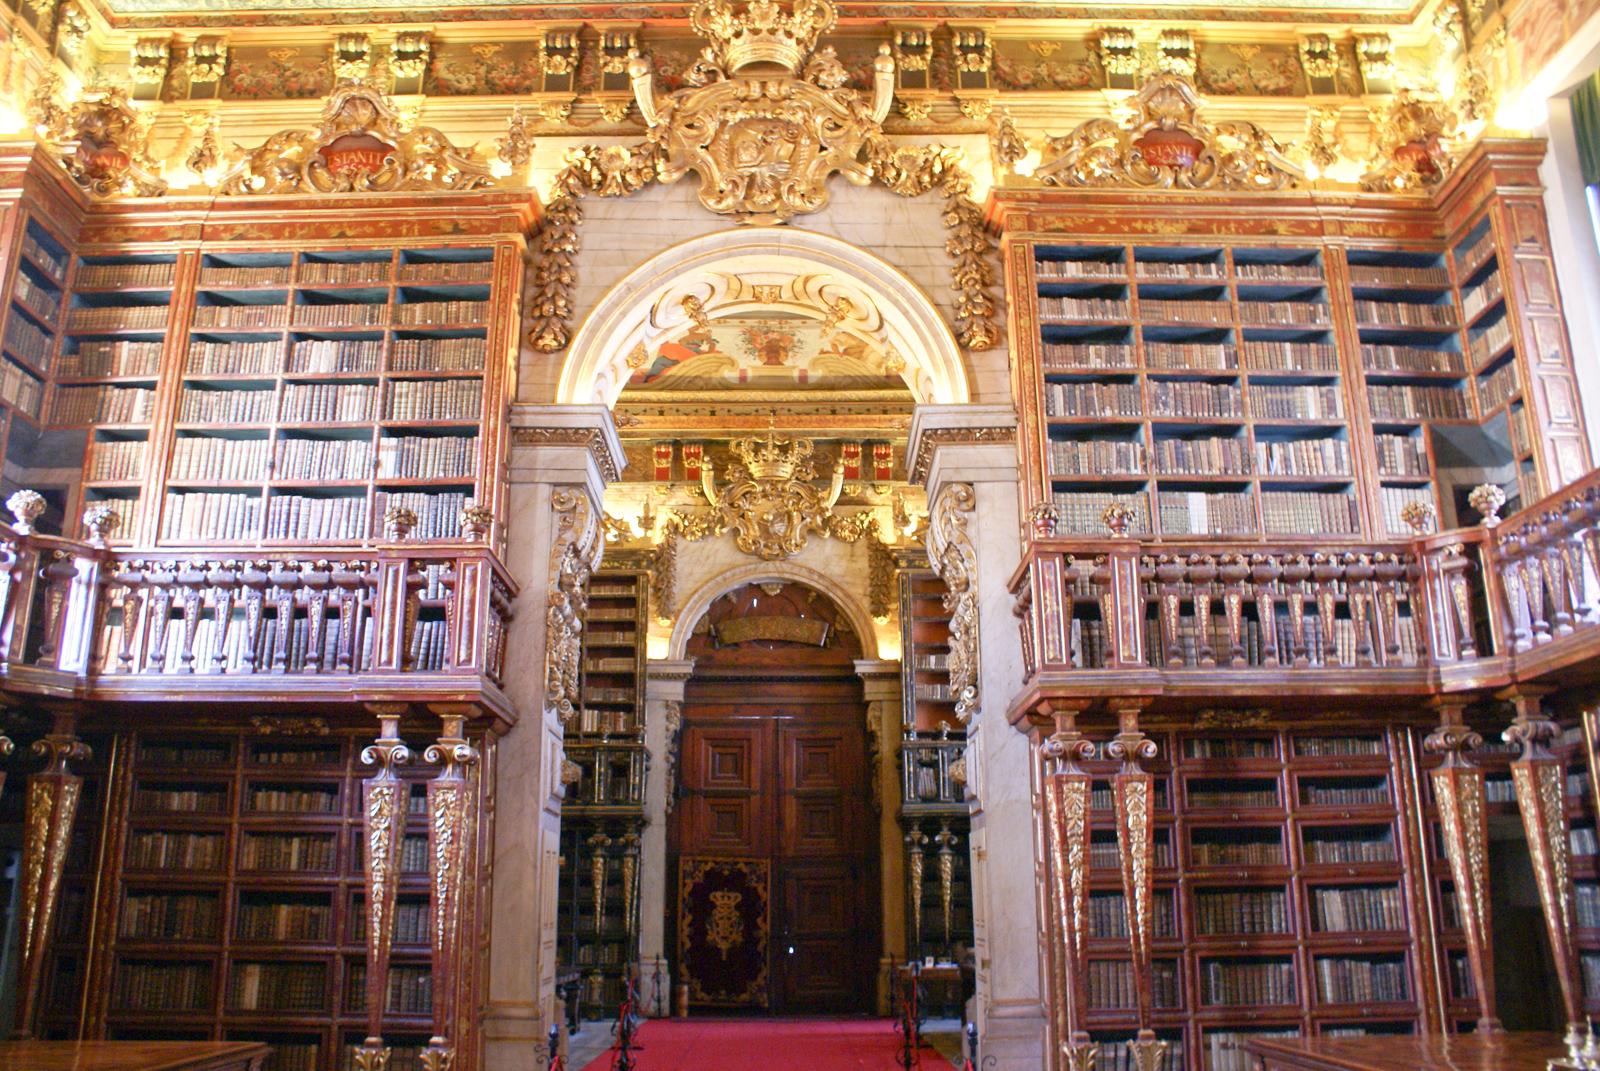 Biblioteca Joanina at the University of Coimbra.